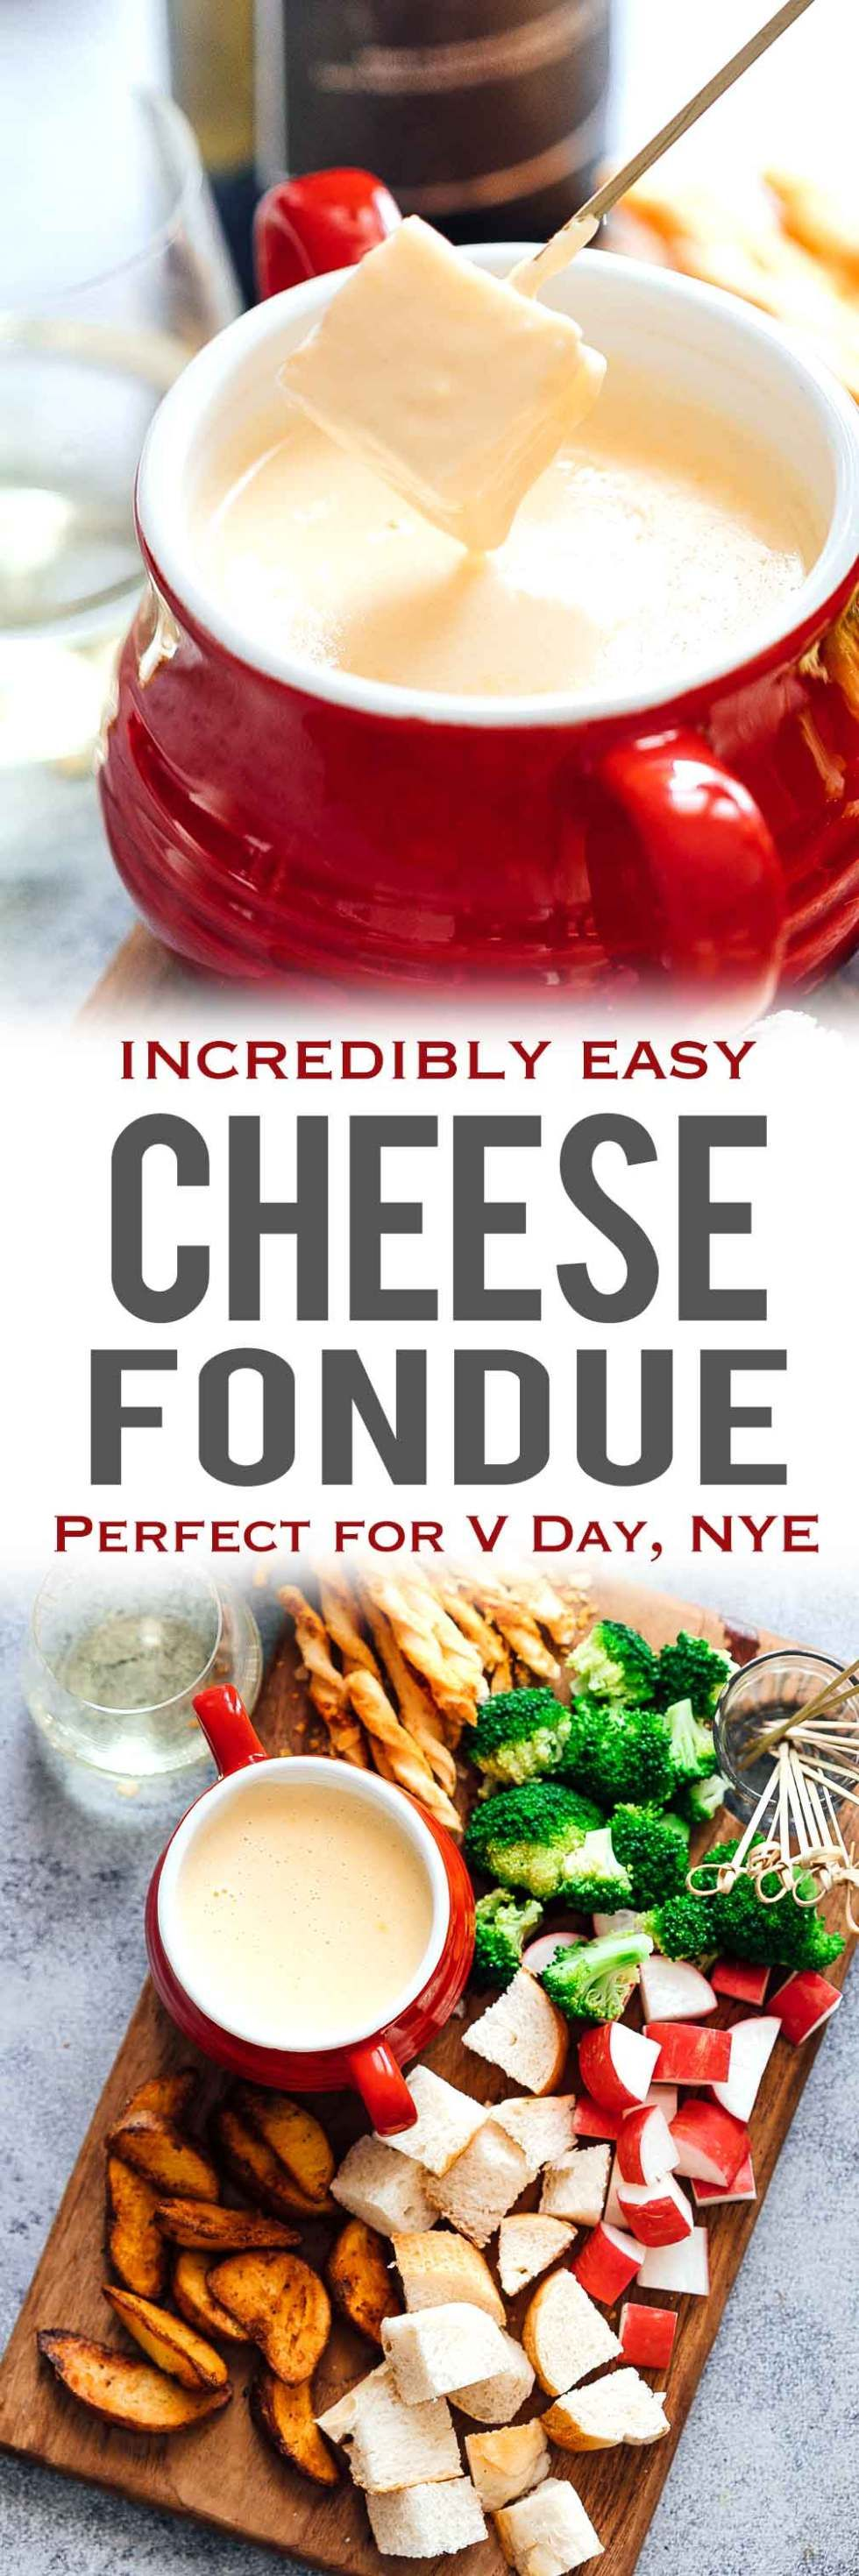 Easy Cheese Fondue Recipe With White Wine Recipe Easy Cheese Fondue Fondue Recipes Cheese Easy Cheese